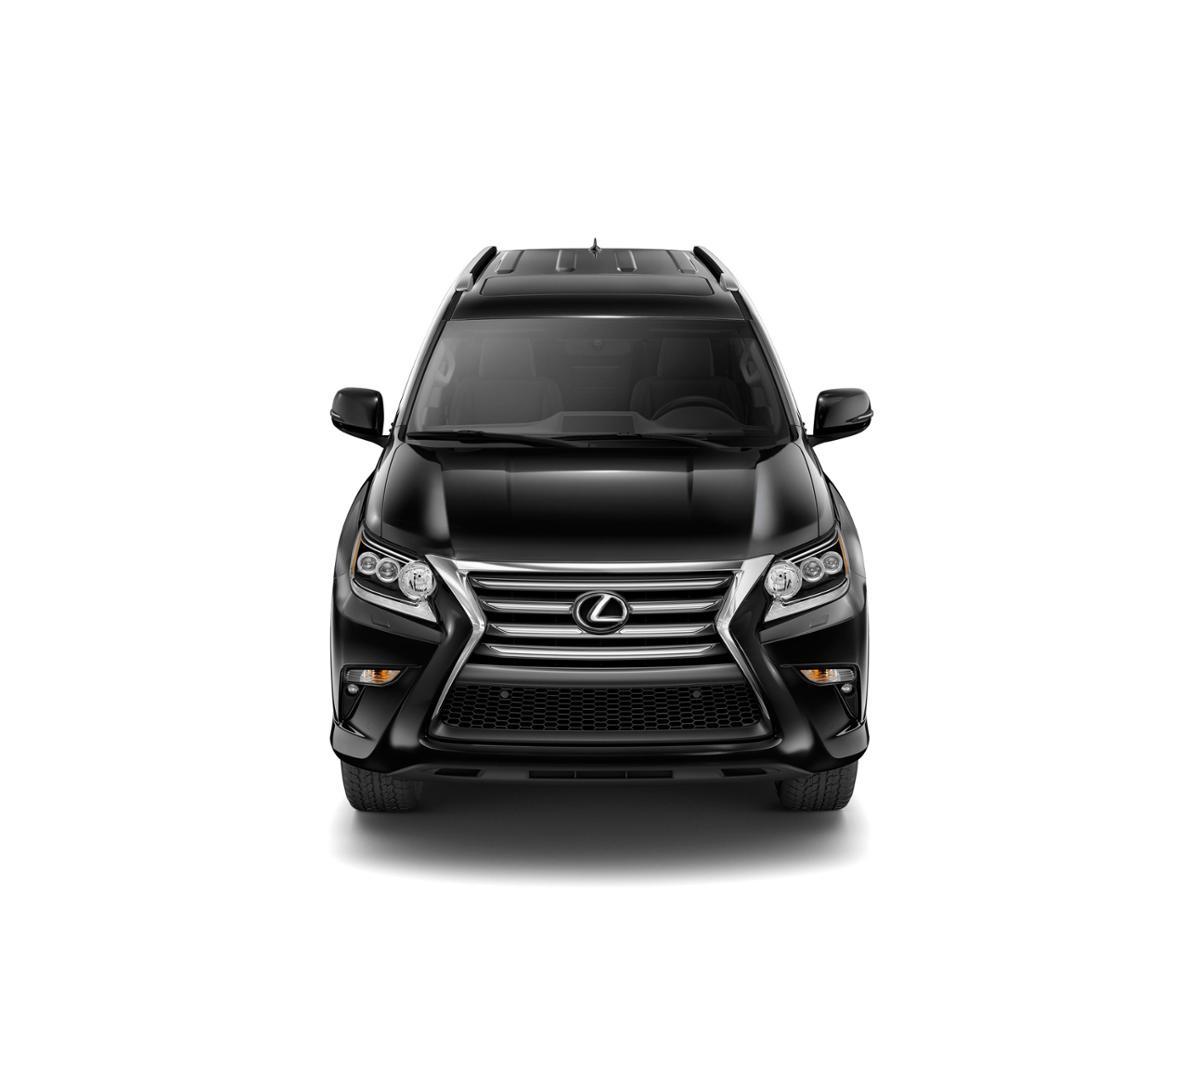 2019 Black Onyx GX 460 Luxury Lexus GX 460 For Sale In San